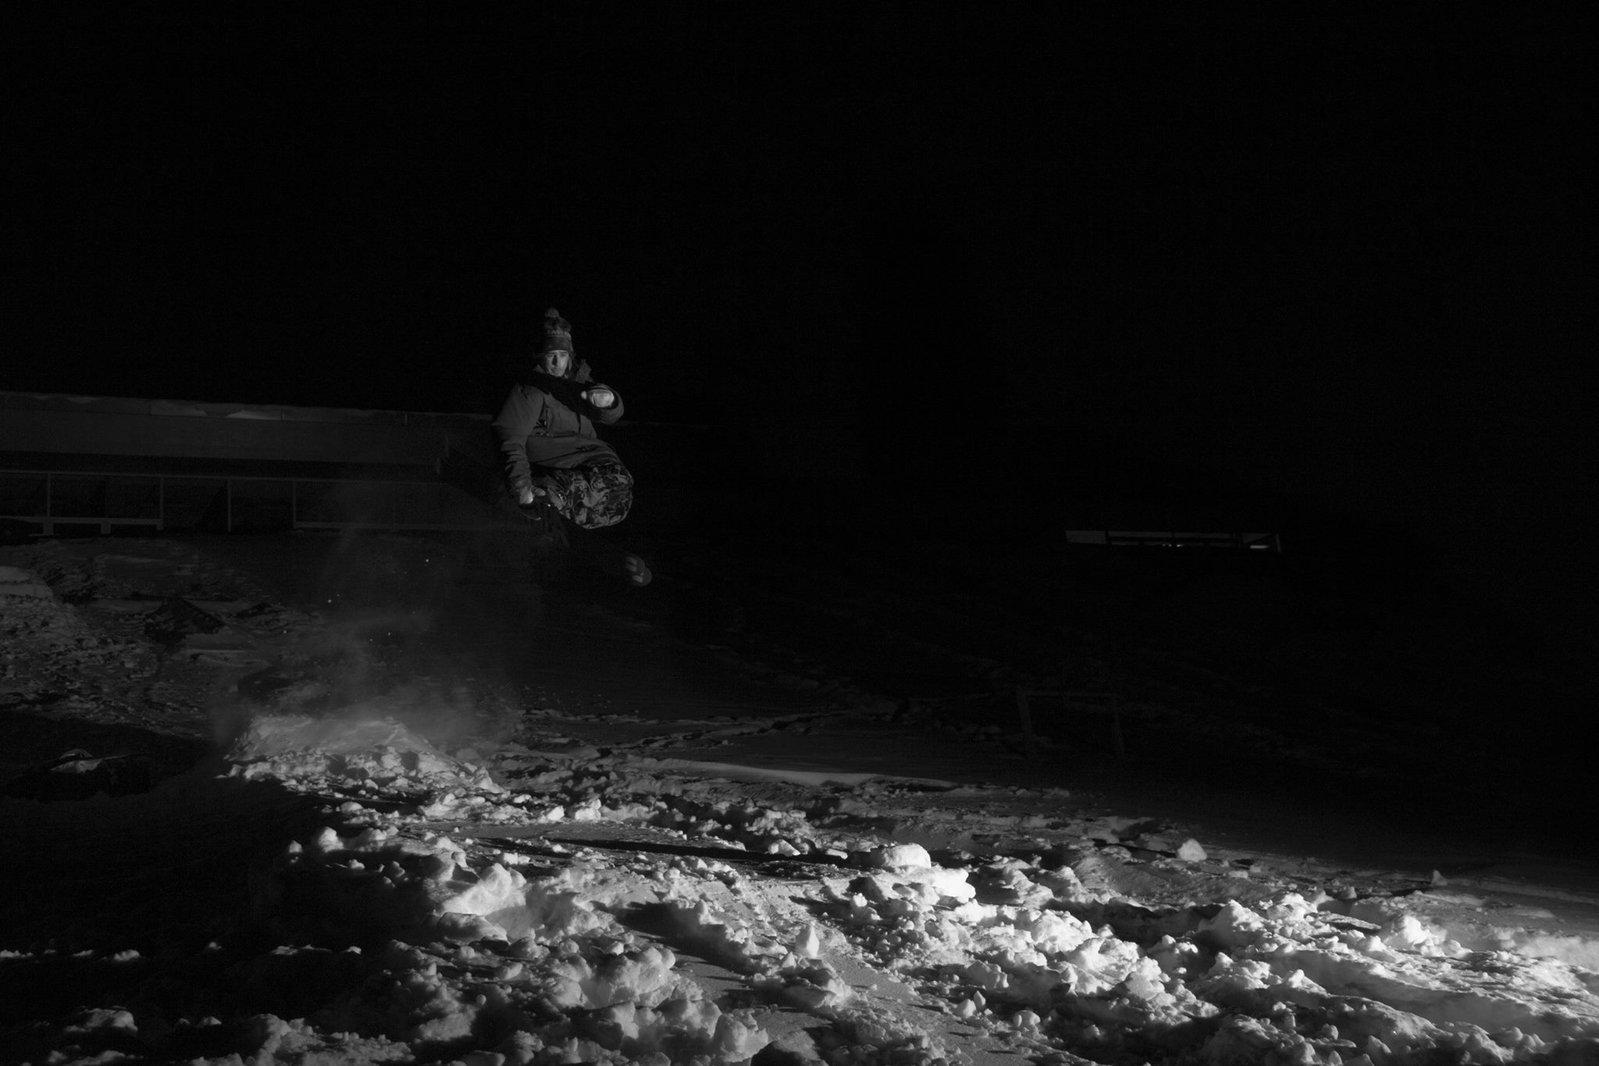 Safety at night